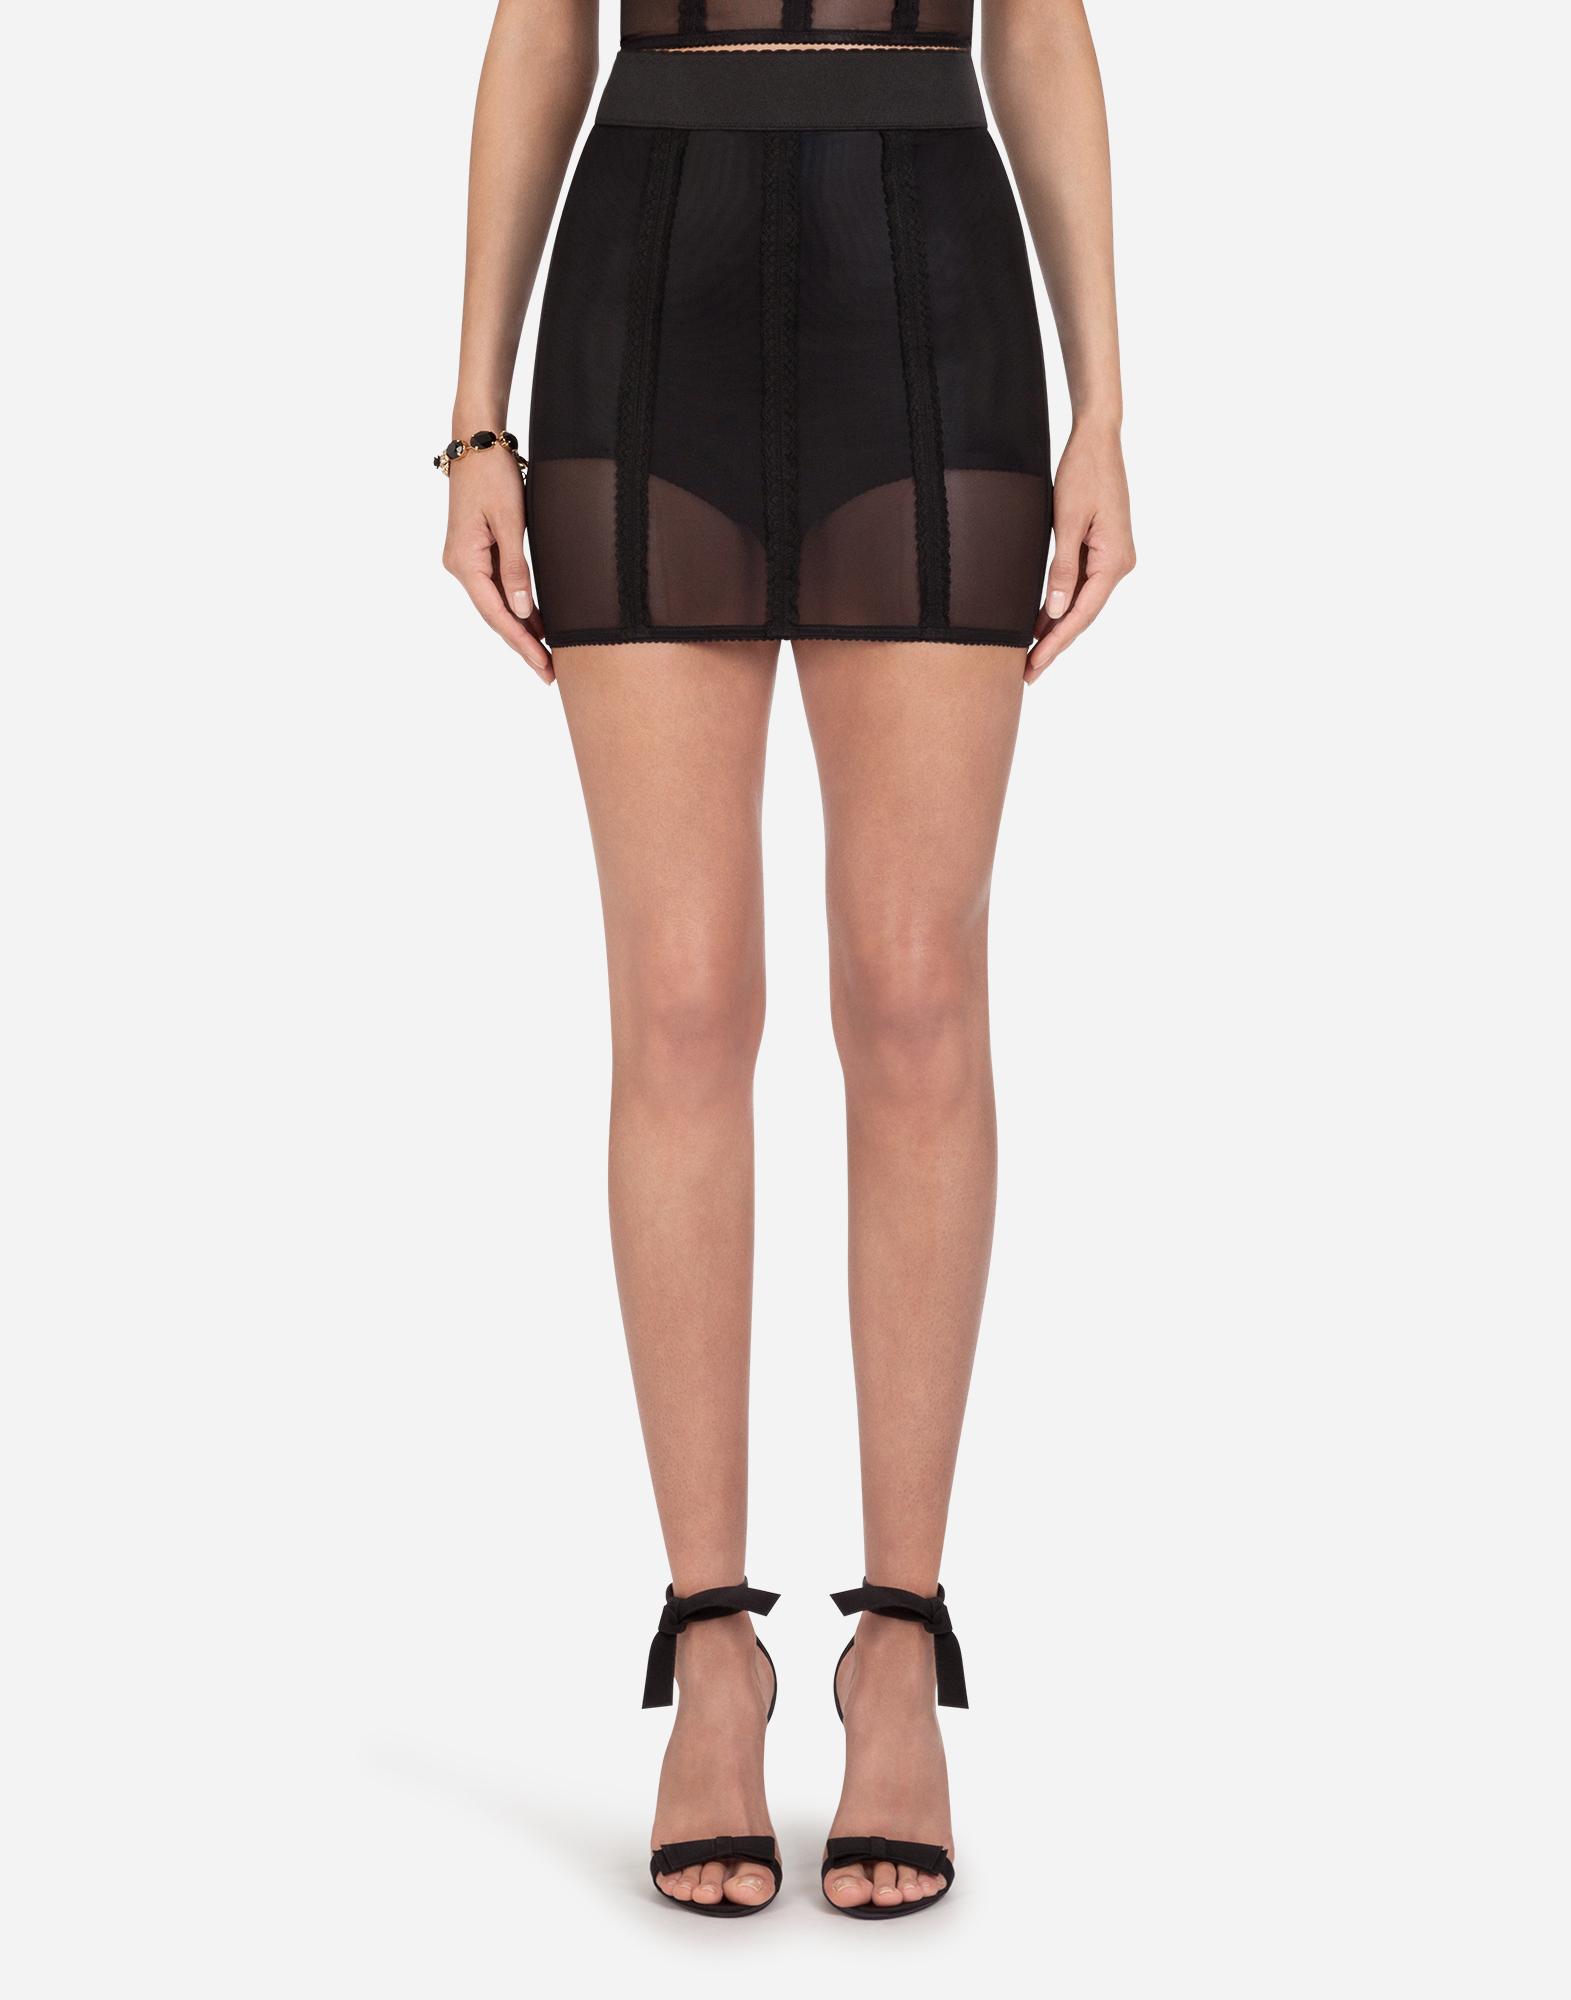 Dolce & Gabbana Short Corset Style Skirt In Elastic In Black